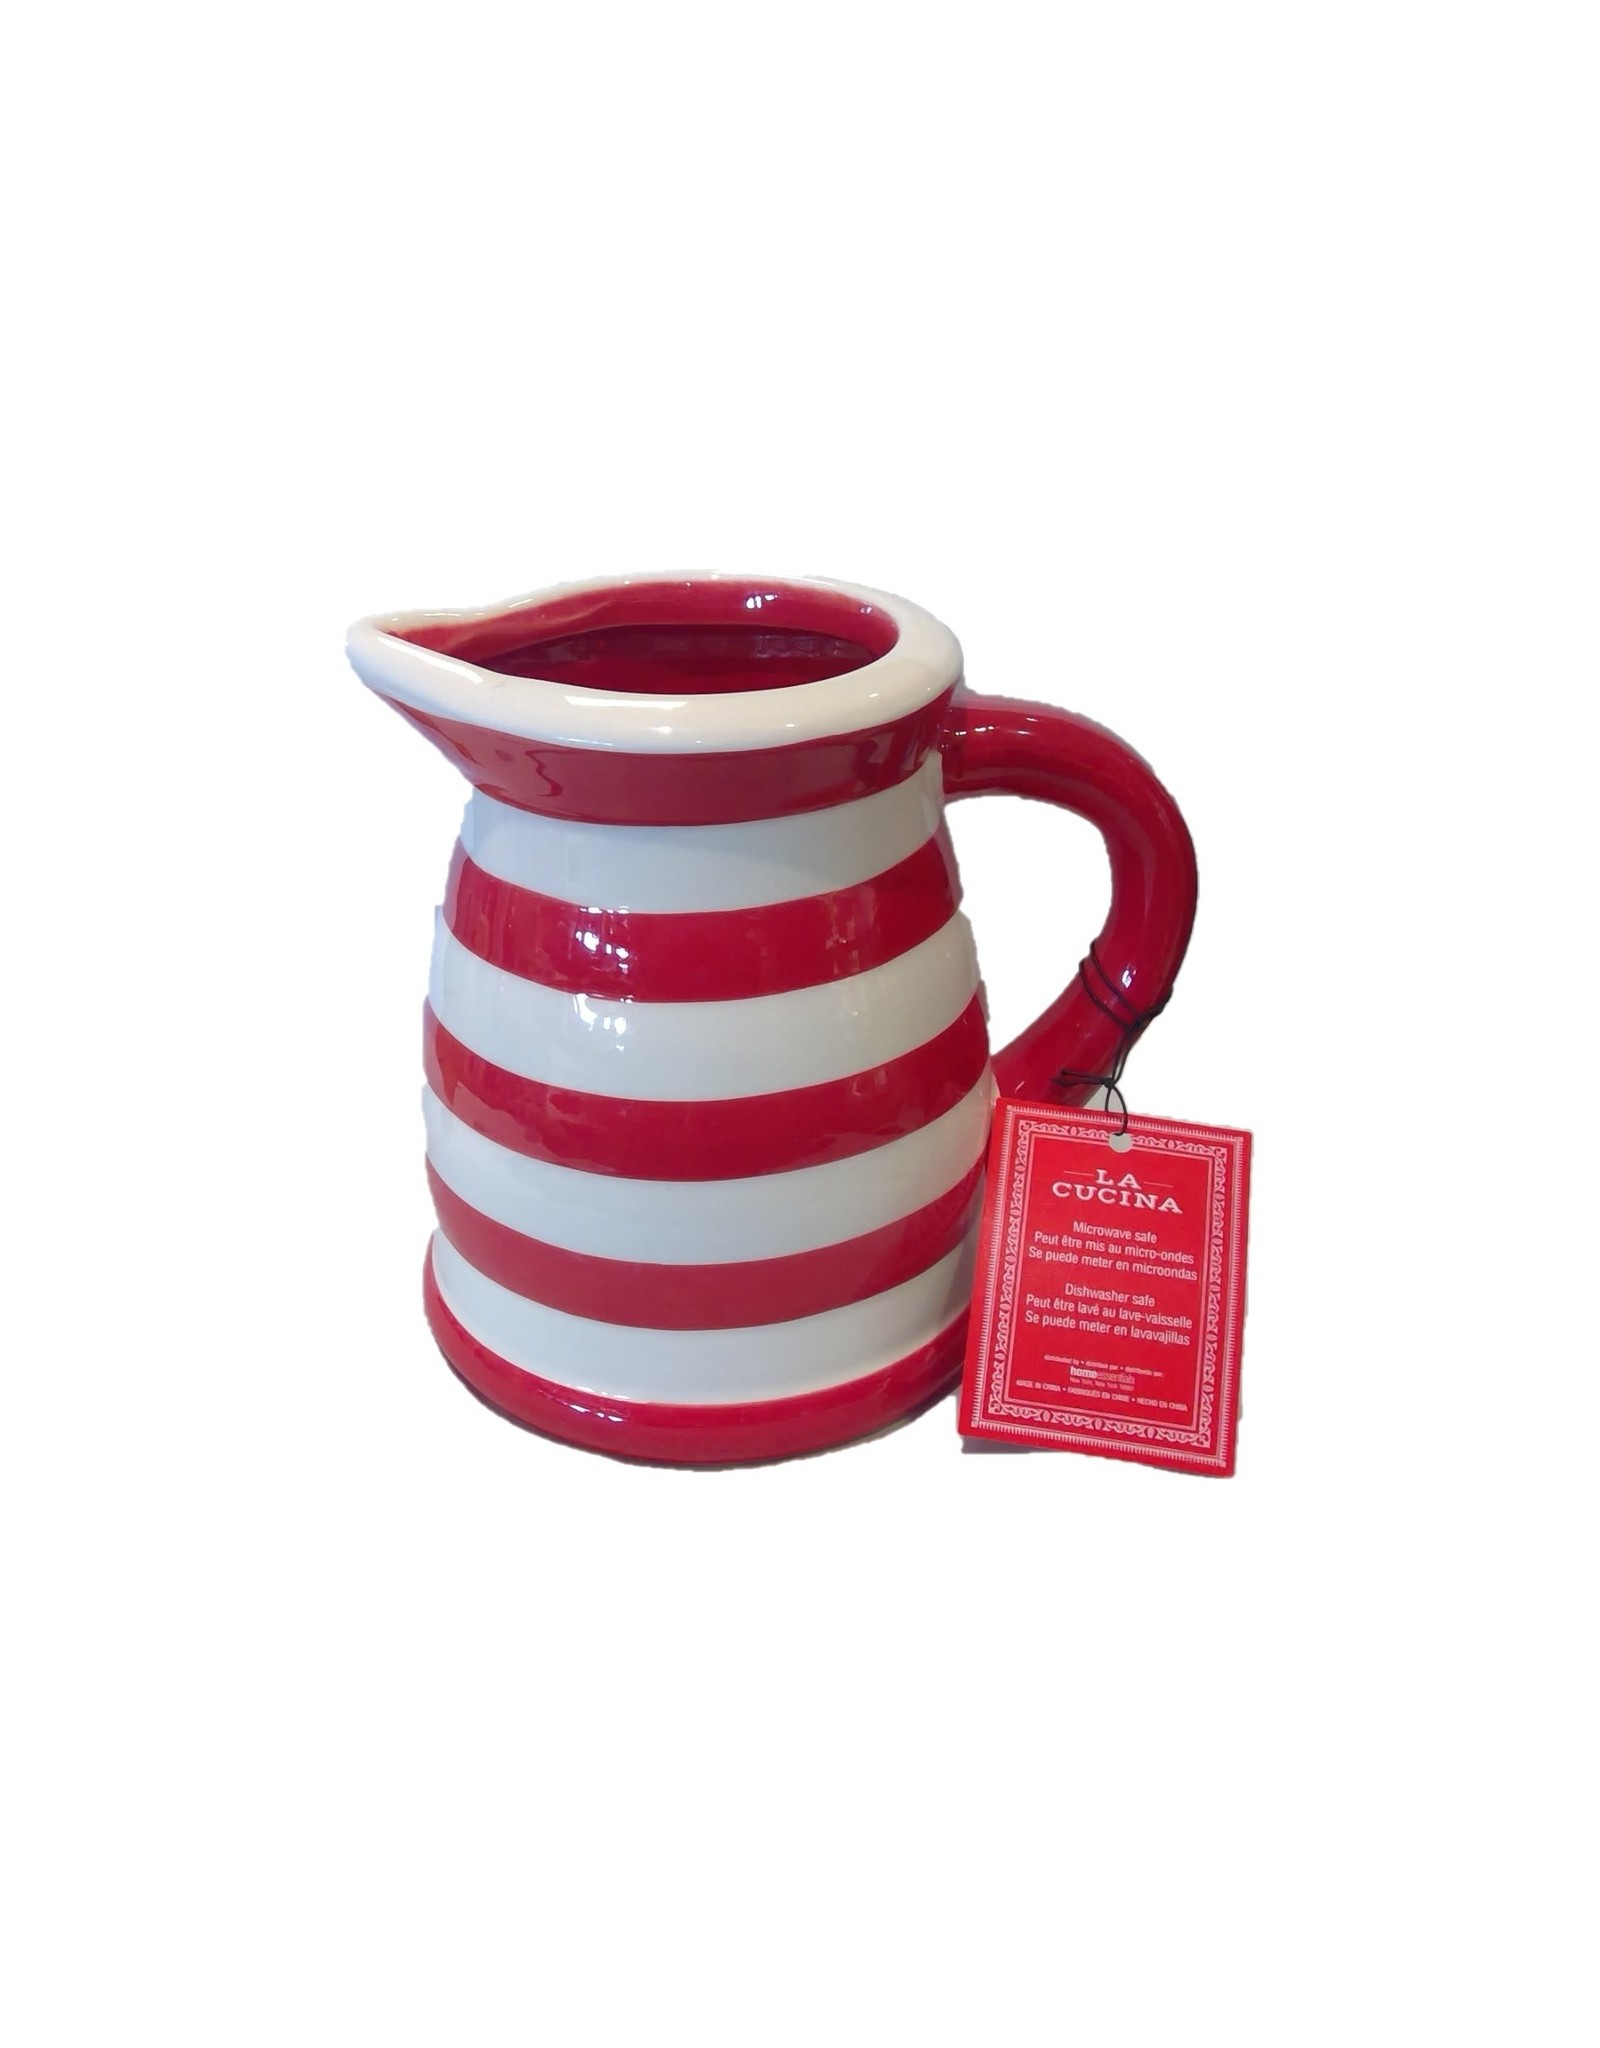 Home Essentials Small Pitcher - Red/White Stripe (22 oz)